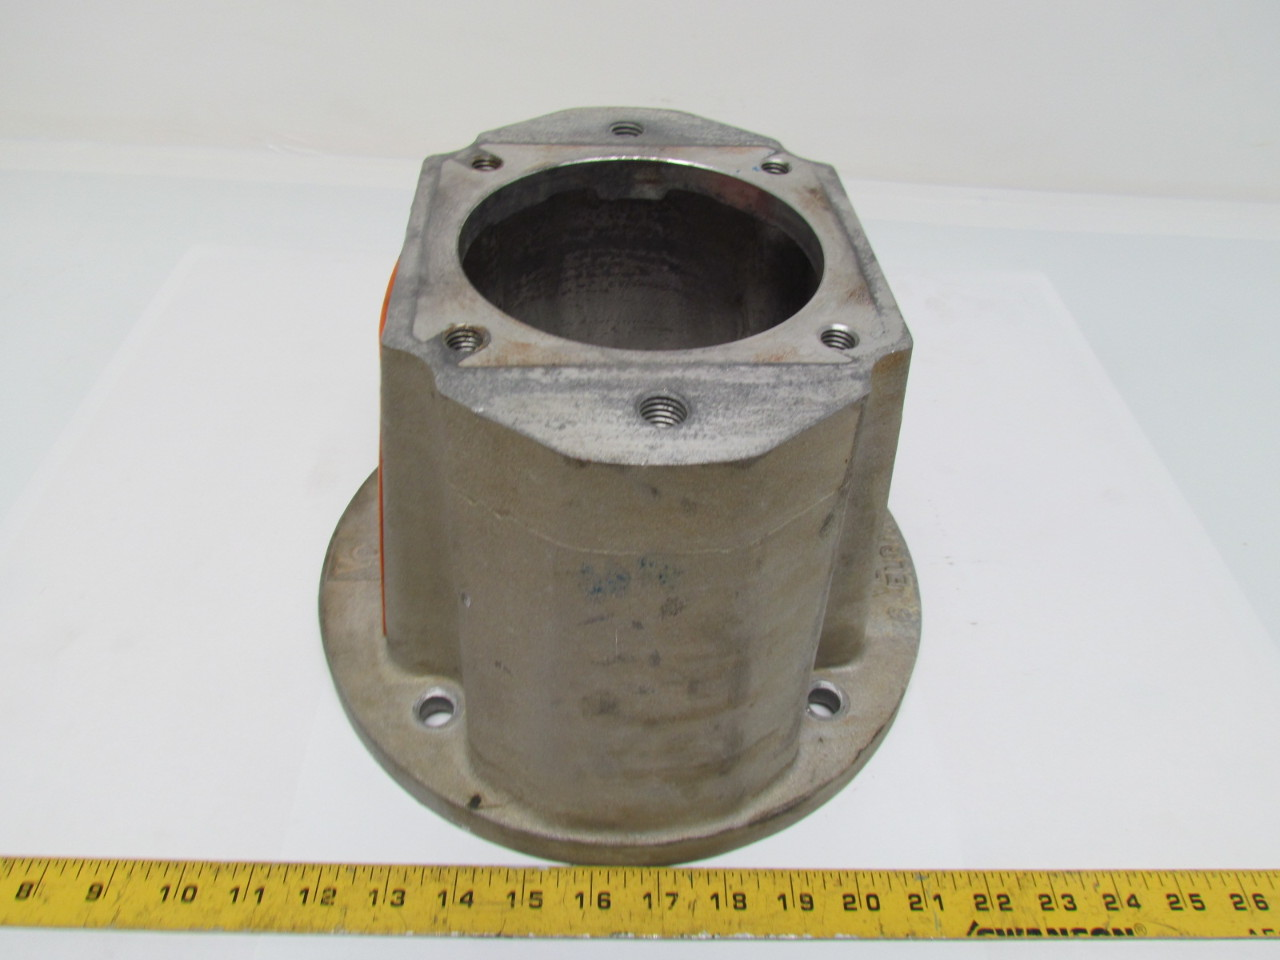 Vescor 1956 pump motor adapter bell housing style 8 ebay for Hydraulic pump motor adapter